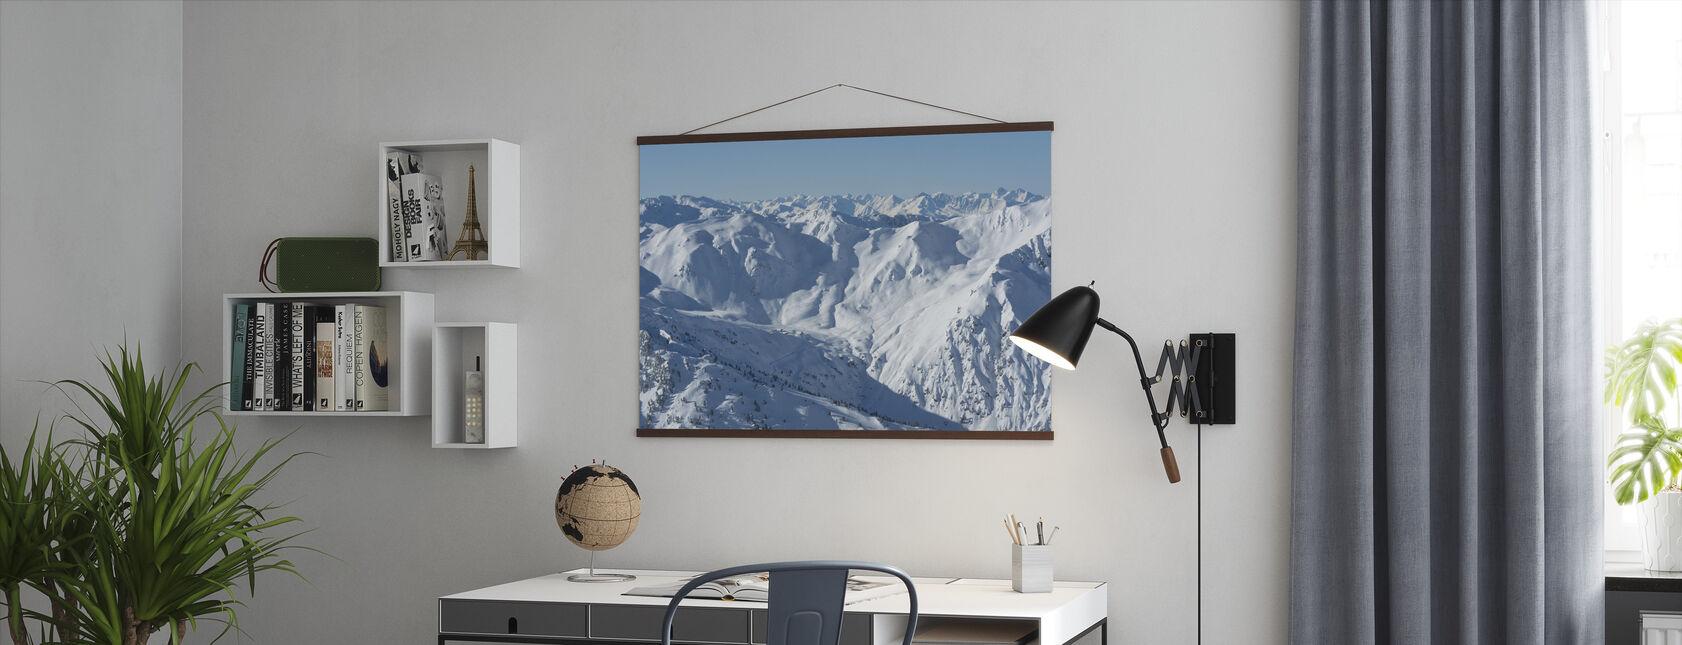 Ski Slopes of Zillertal - Poster - Office